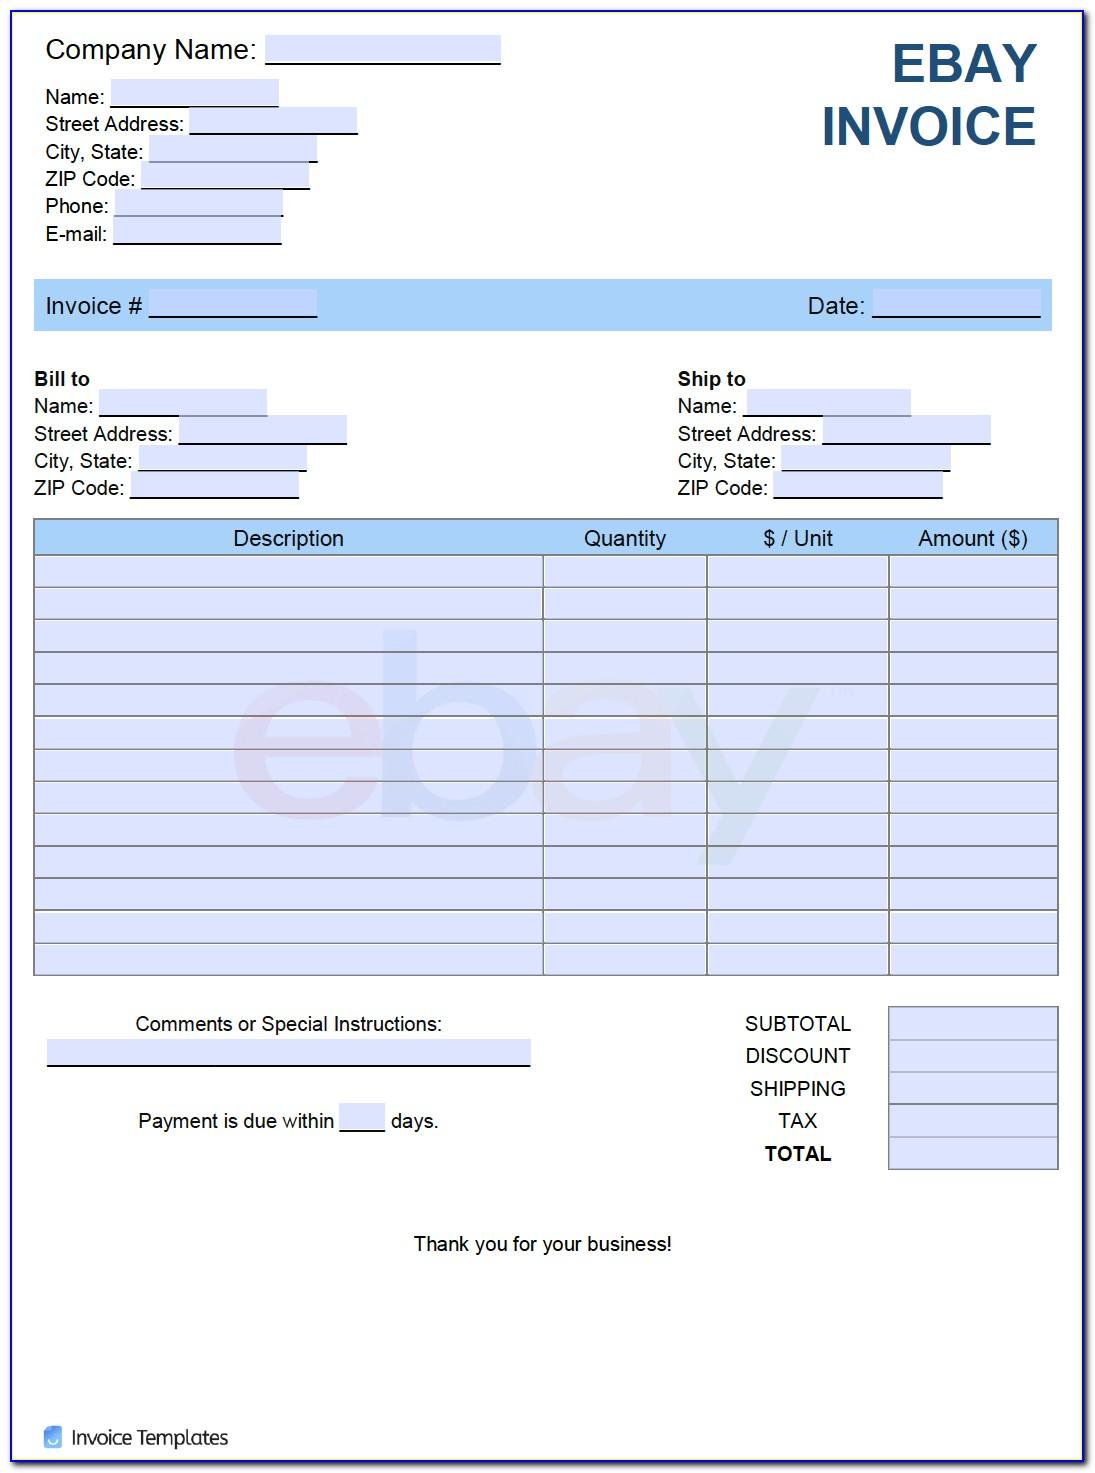 Ebay Vat Invoice Template